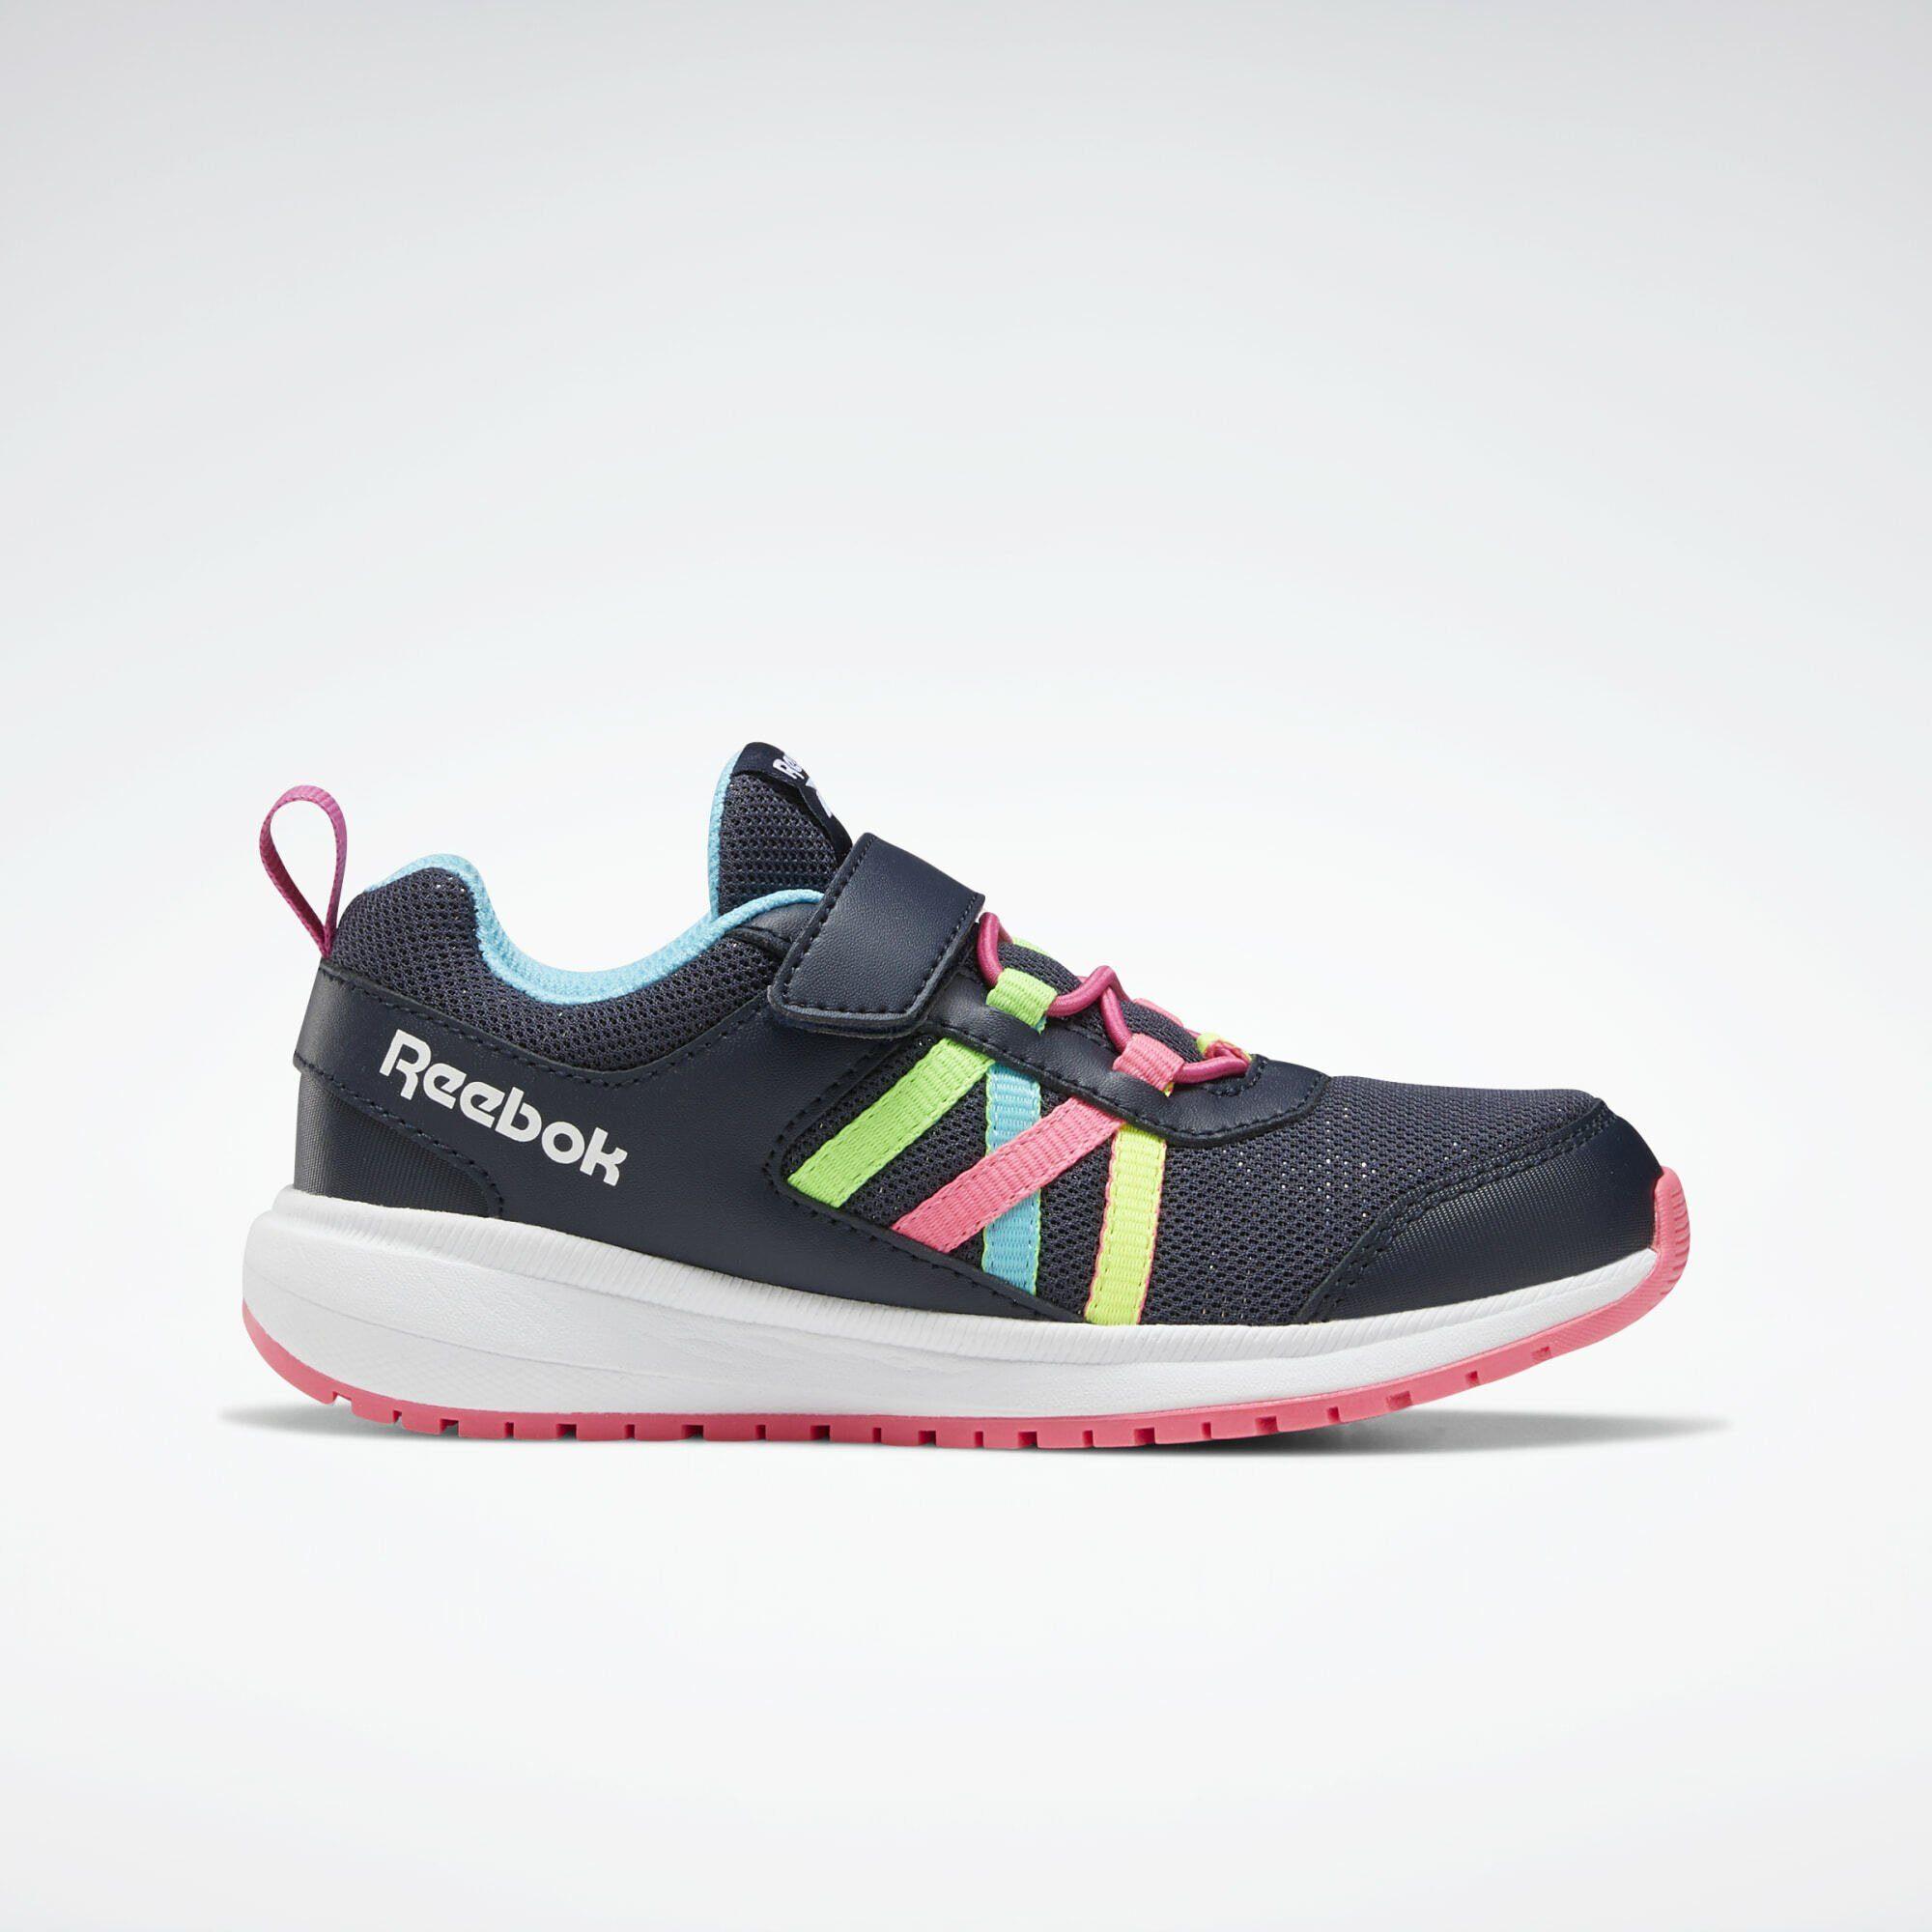 Reebok »Reebok Road Supreme Shoes« Trainingsschuh | OTTO